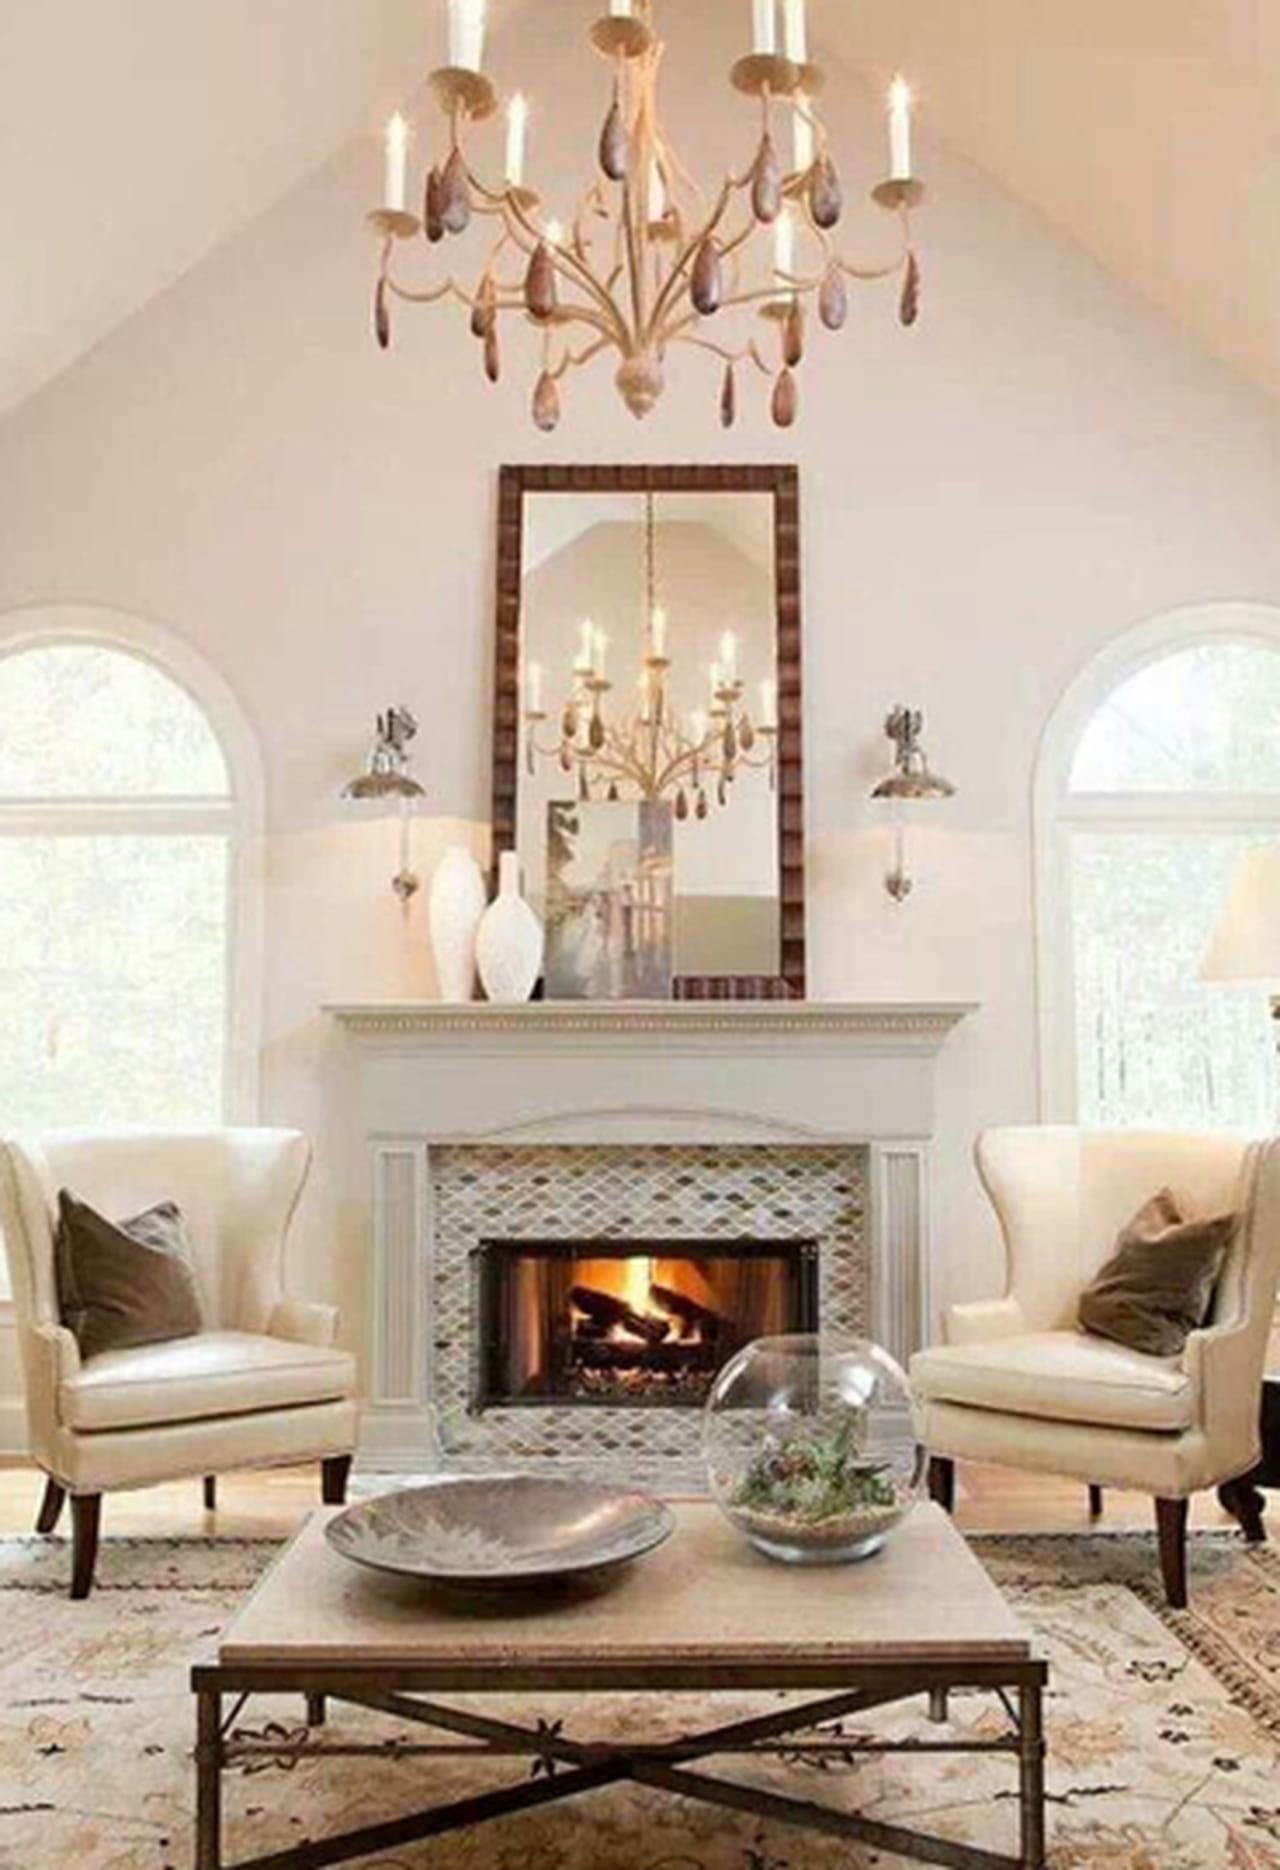 Barn Wood Wall Fireplace